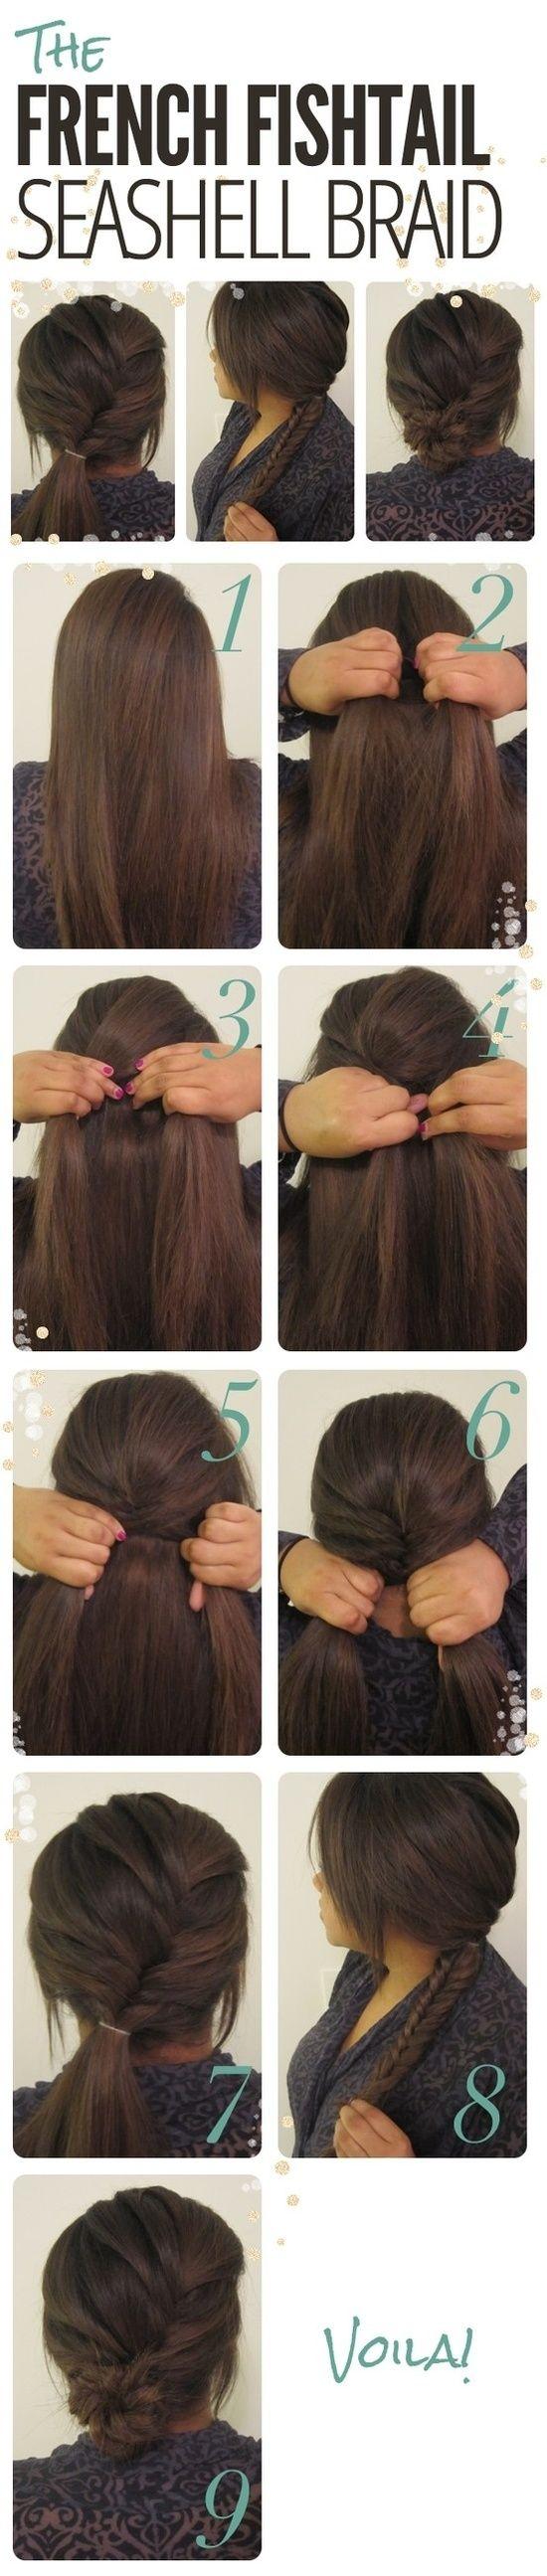 Stupendous 1000 Ideas About French Fishtail Braids On Pinterest French Short Hairstyles Gunalazisus